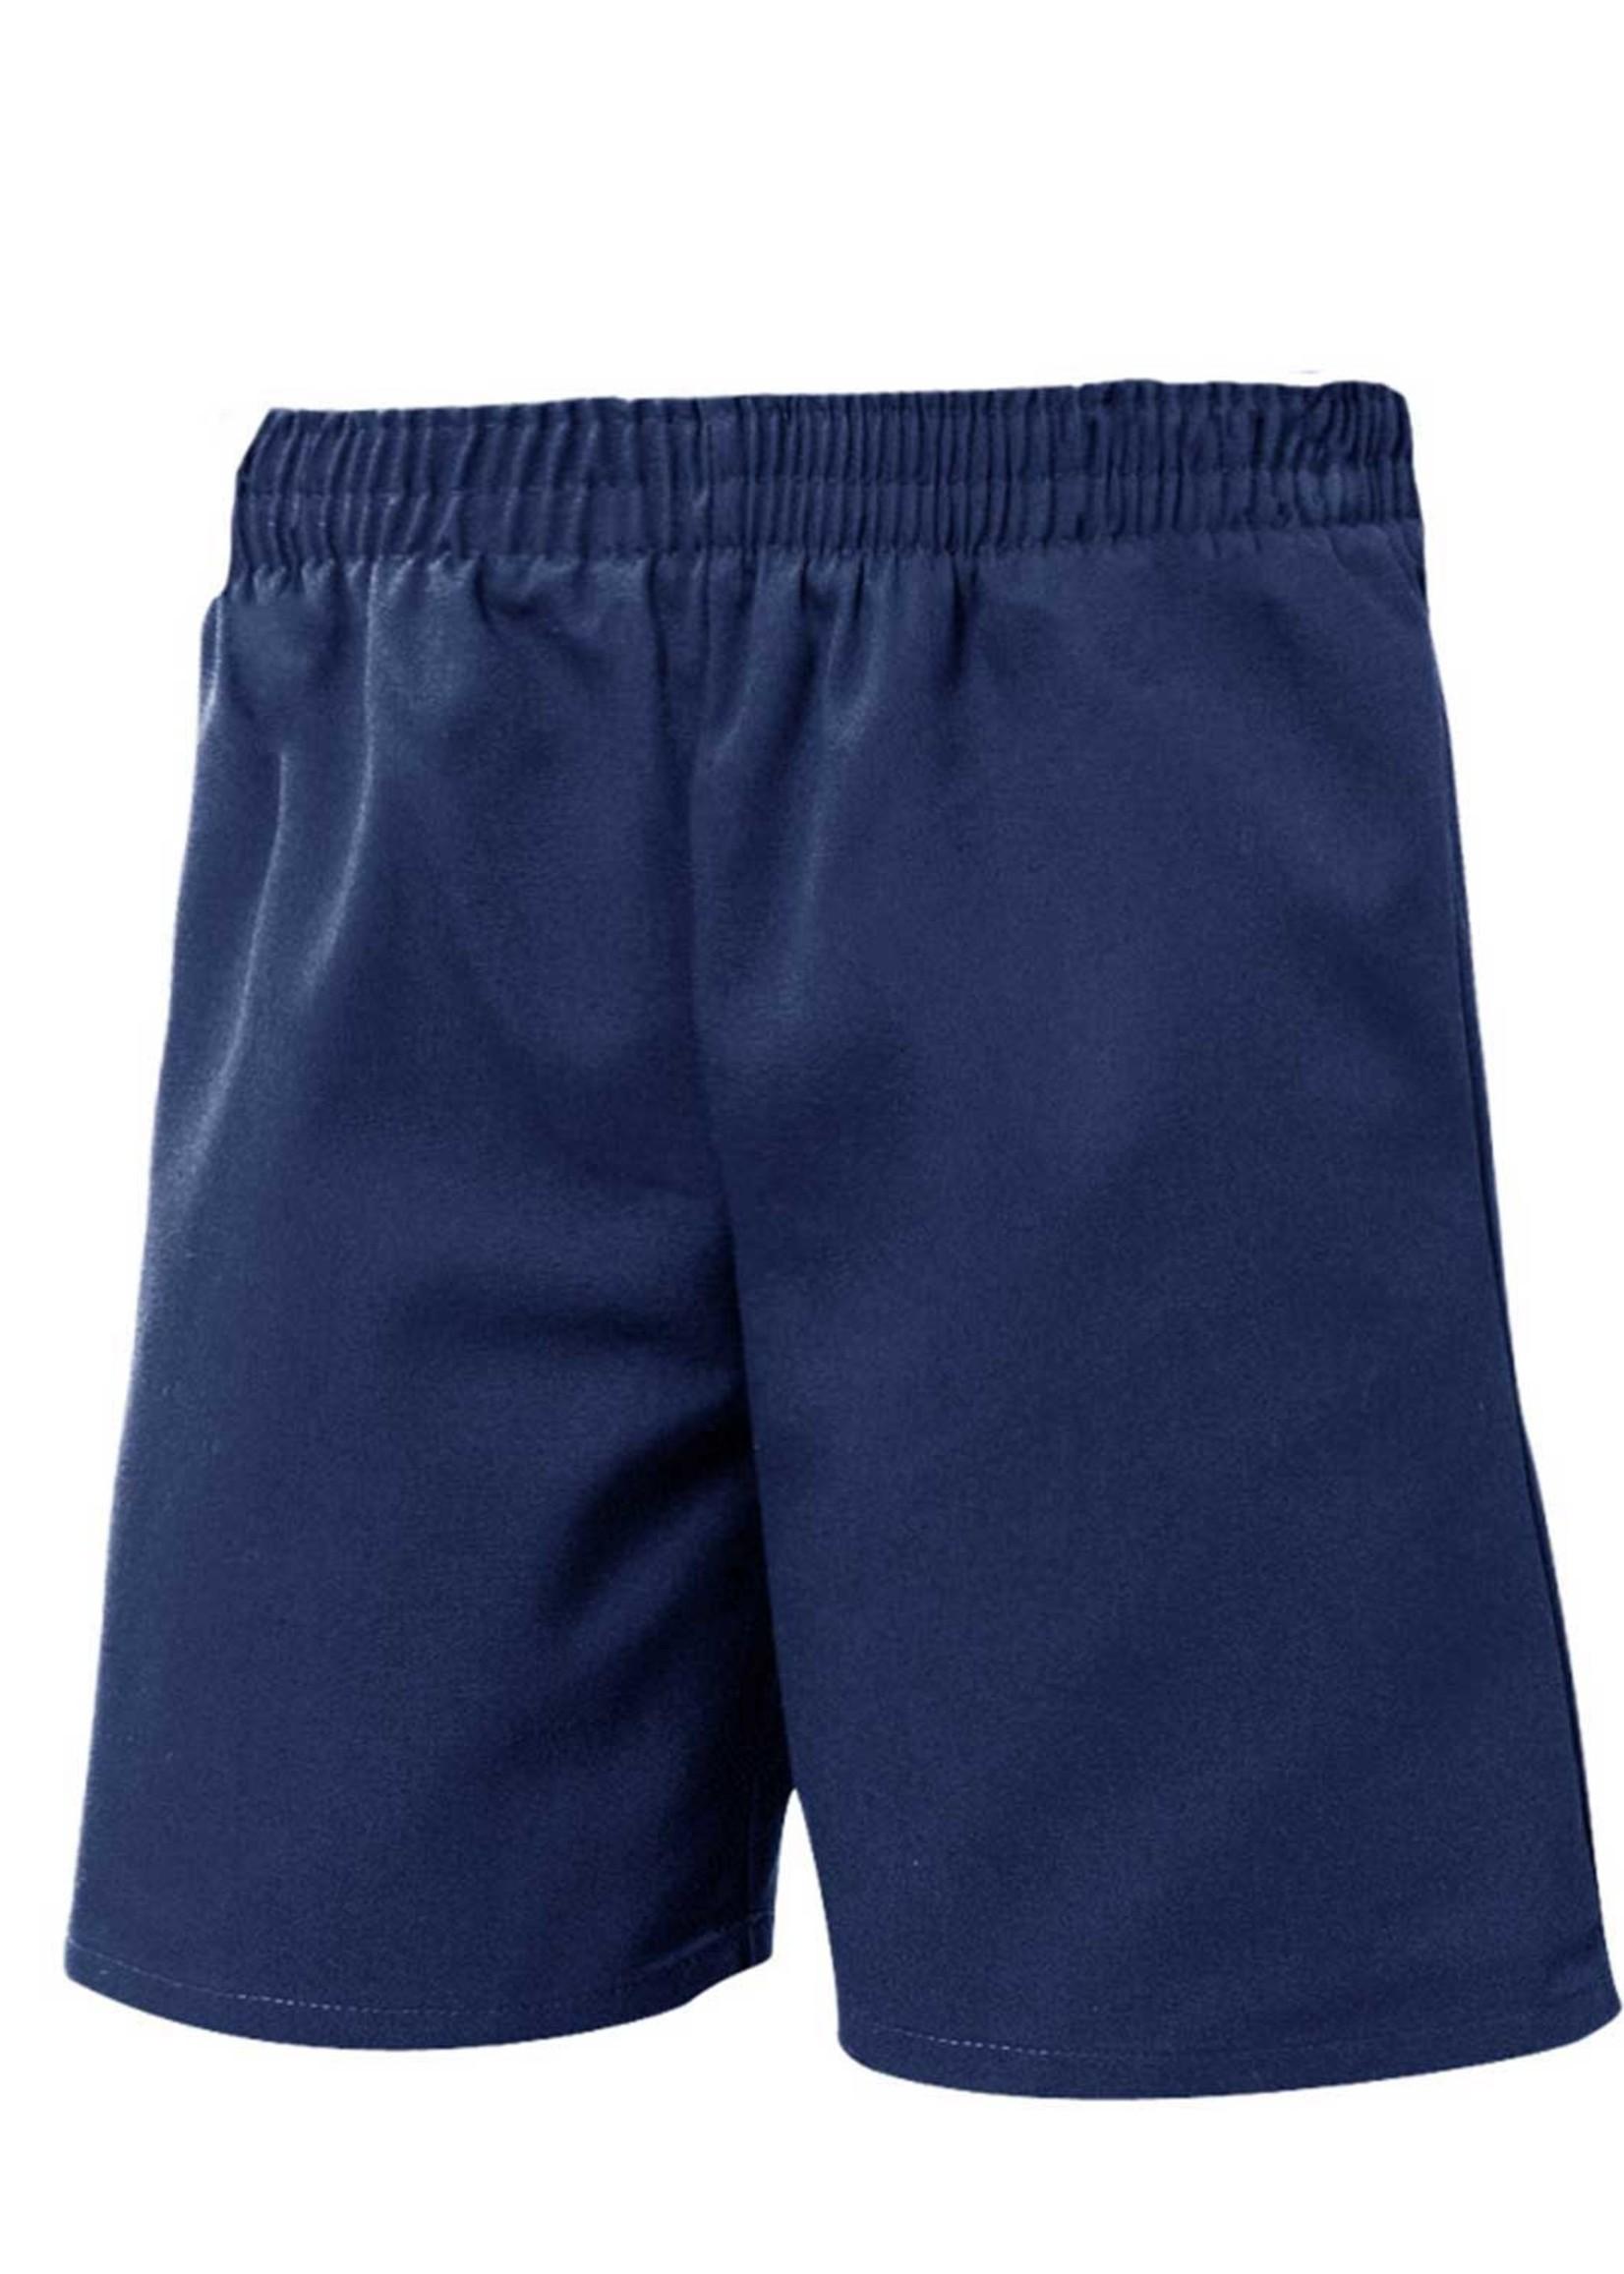 A+ Unisex Navy Pull On Shorts